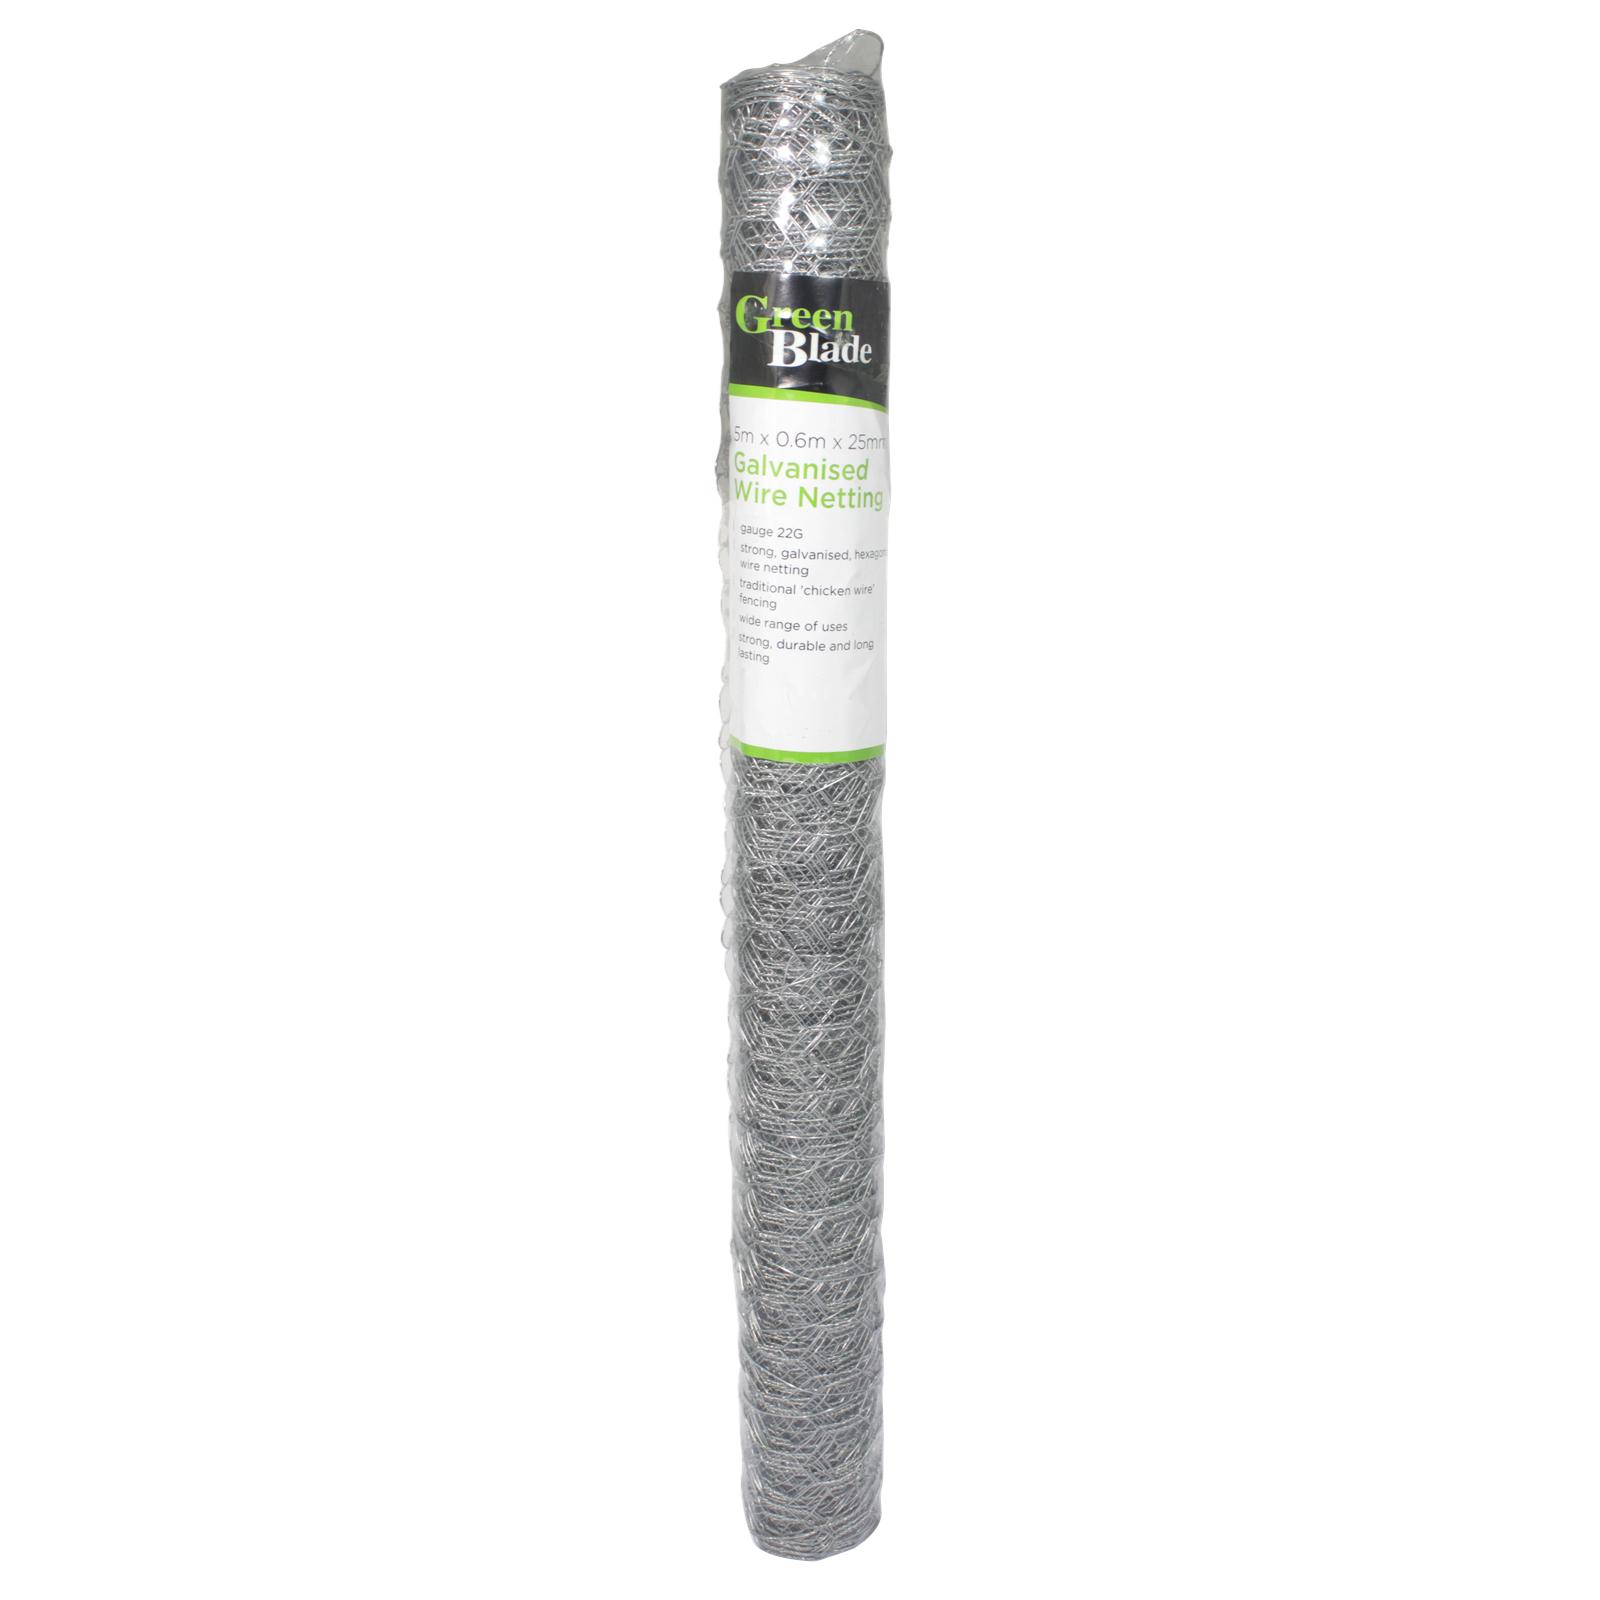 GREEN BLADE GALVANISED WIRE NETTING 5MX0.6MX25MM